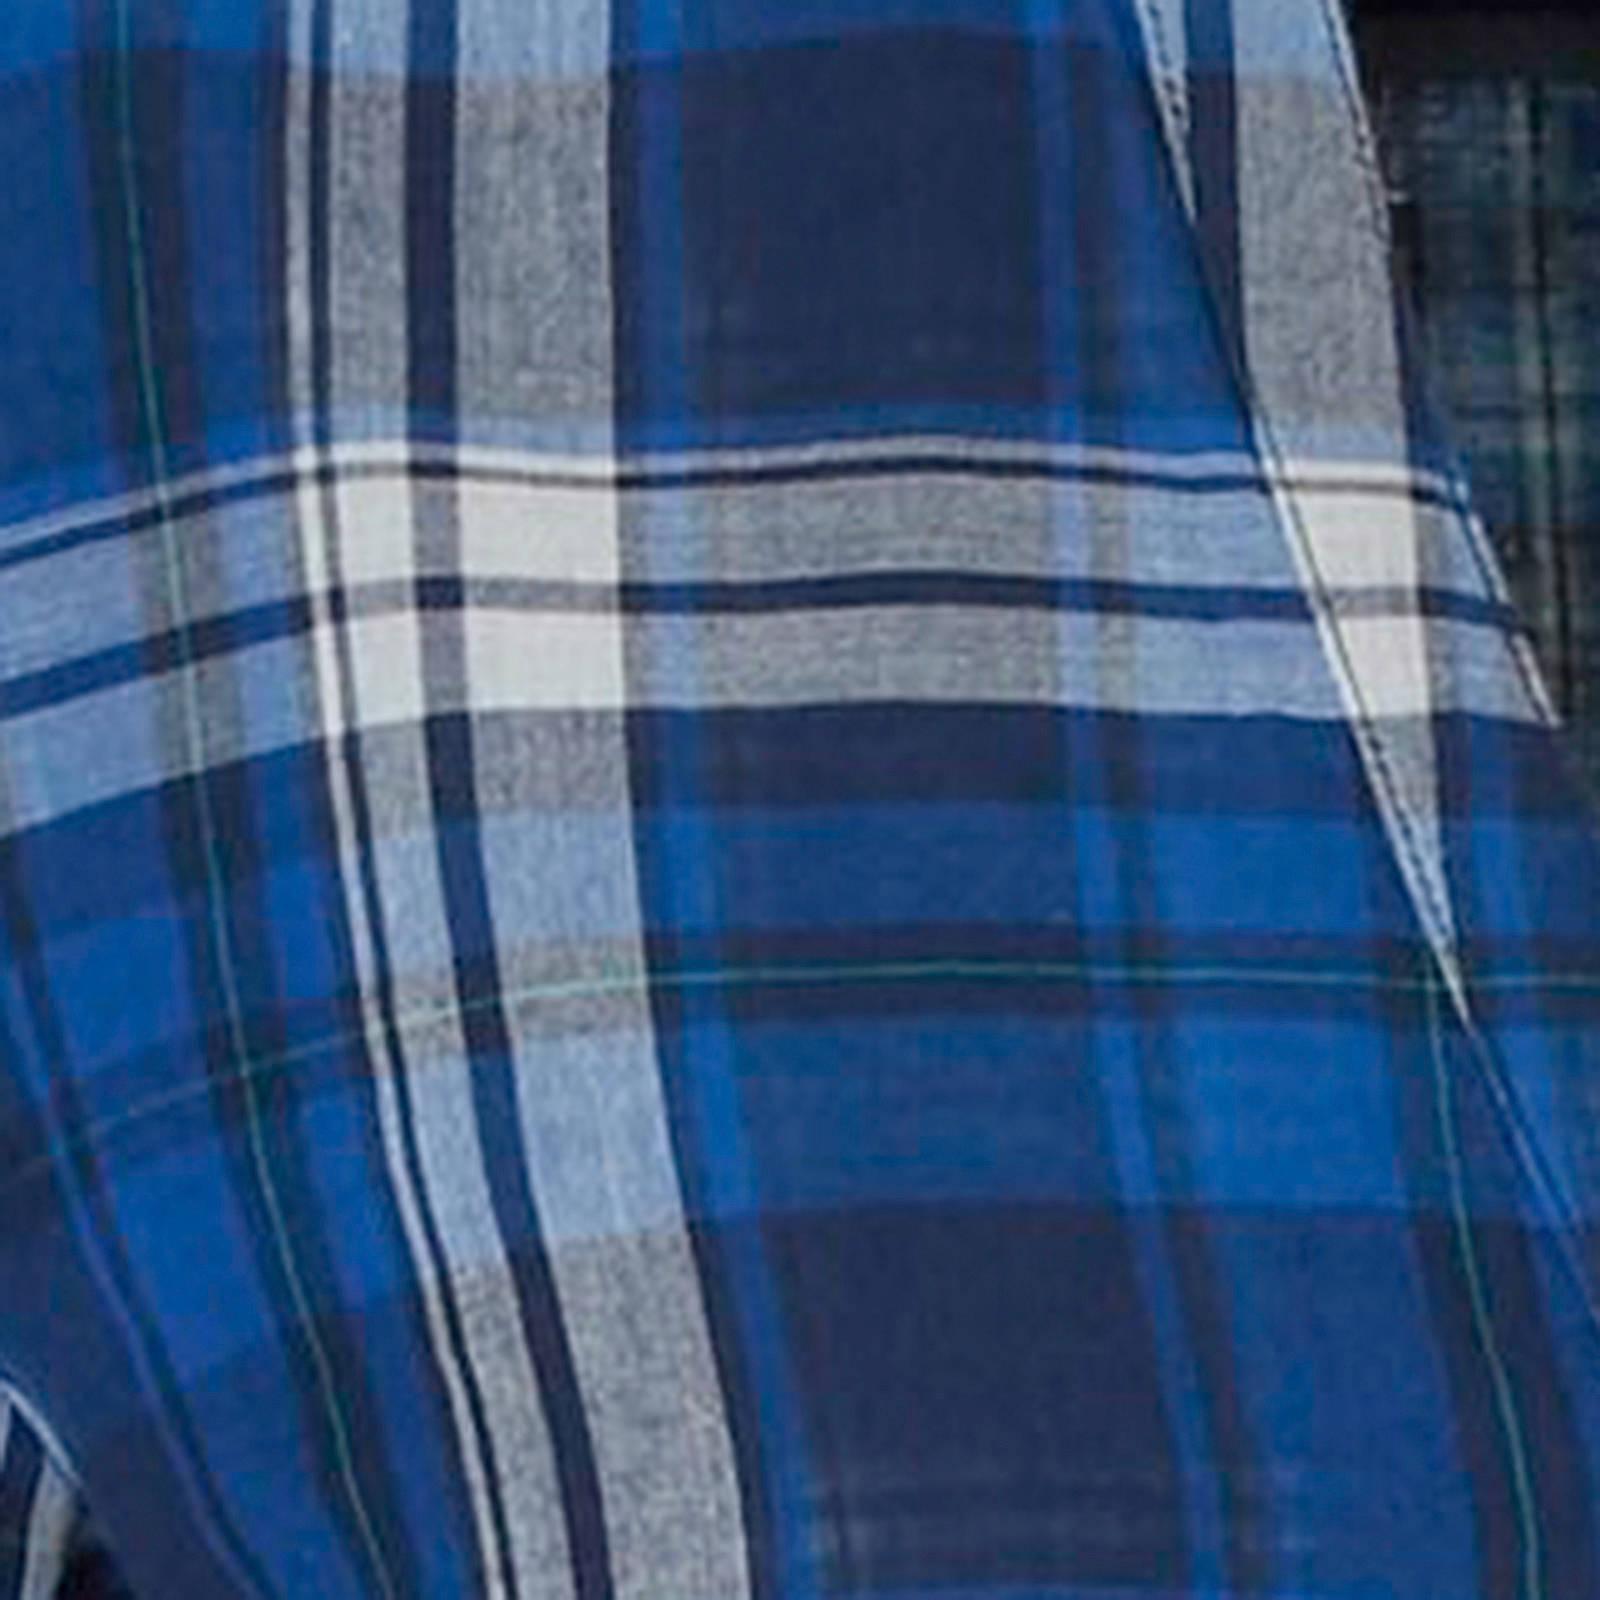 ESPRIT ESPRIT Women geruite Casual Casual geruite blouse Women blouse Casual ESPRIT Women ESPRIT blouse geruite wwfqrZY